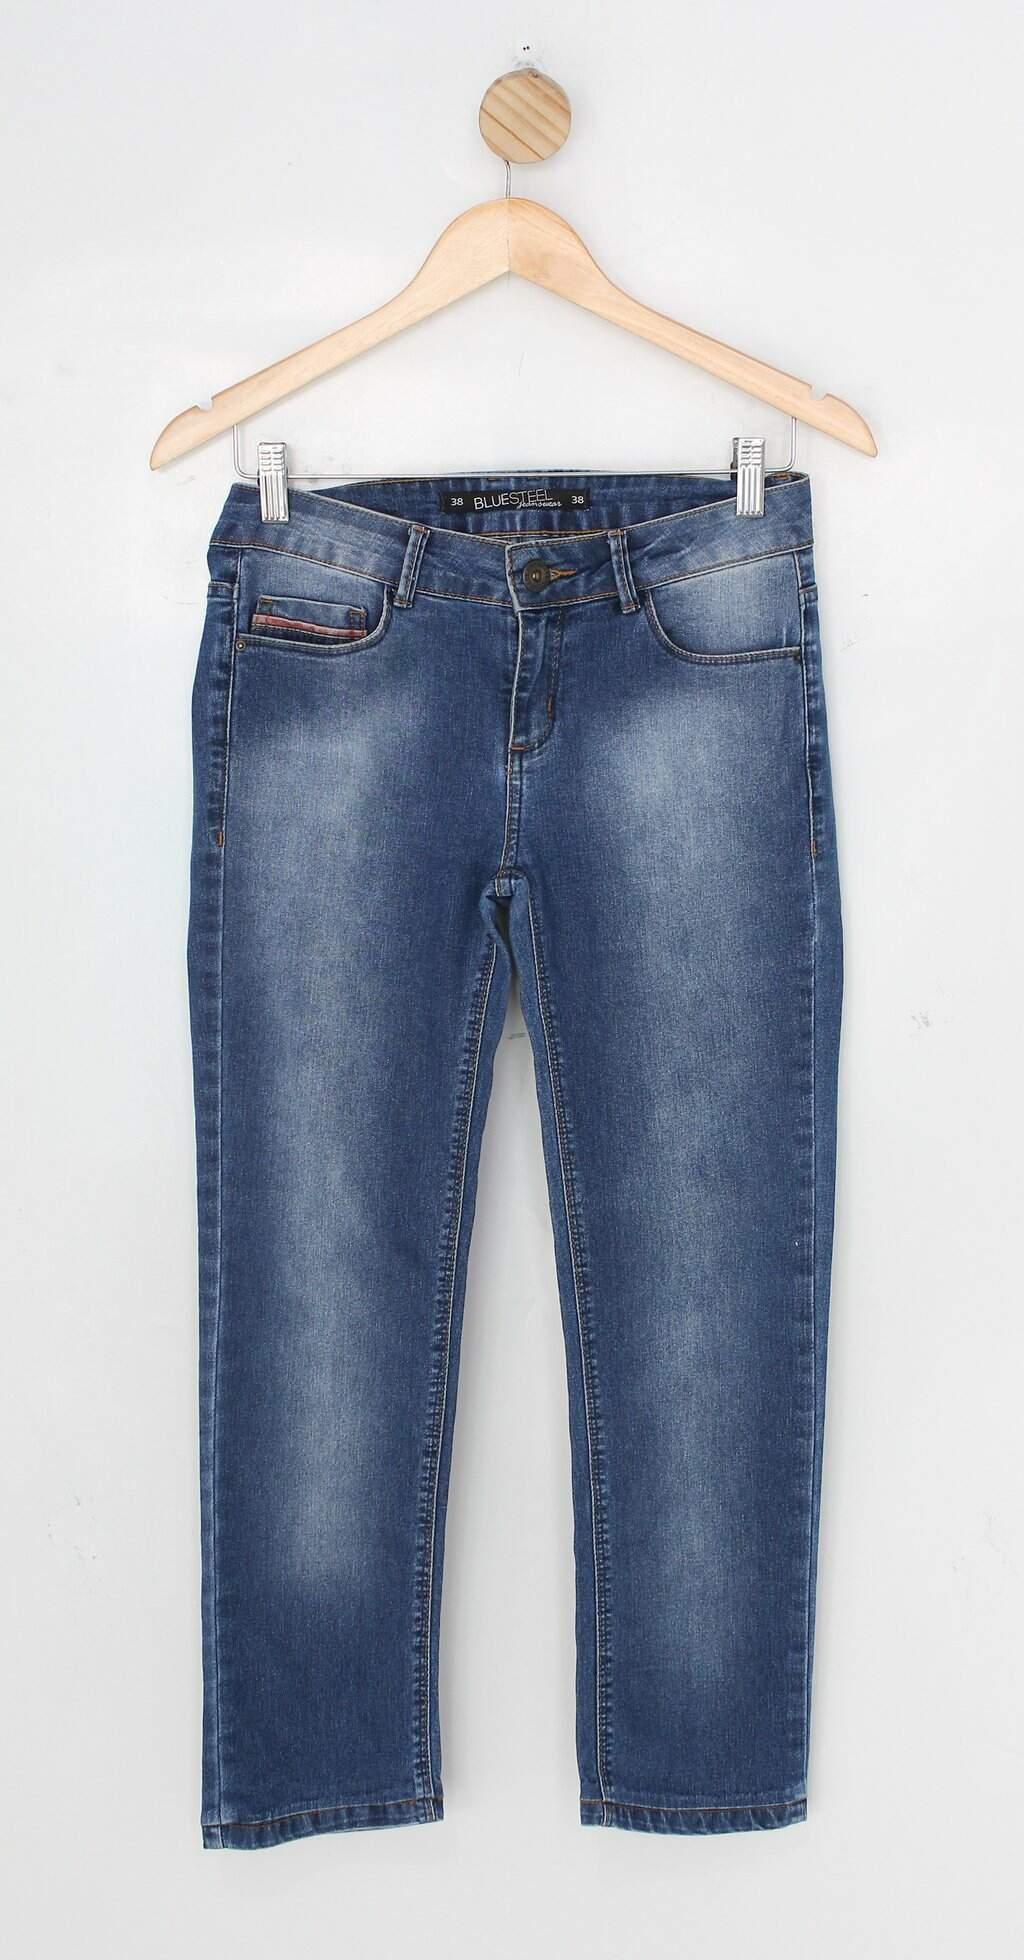 Calça Jeans Renner Feminina Azul